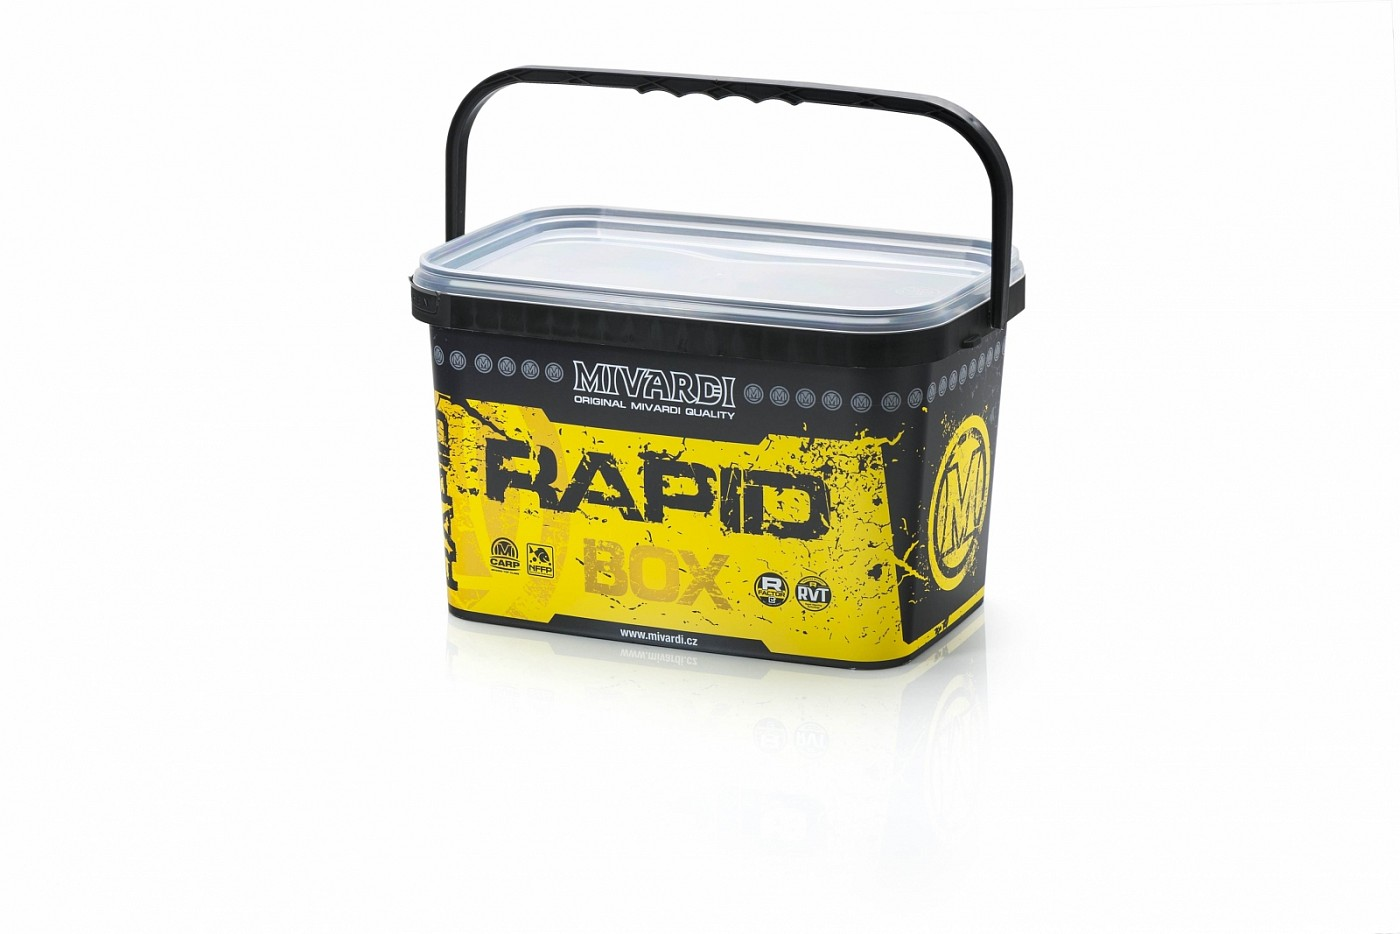 /produkty/227/vedra-okyslicovace/Mivardi/Rapid-Box-XL